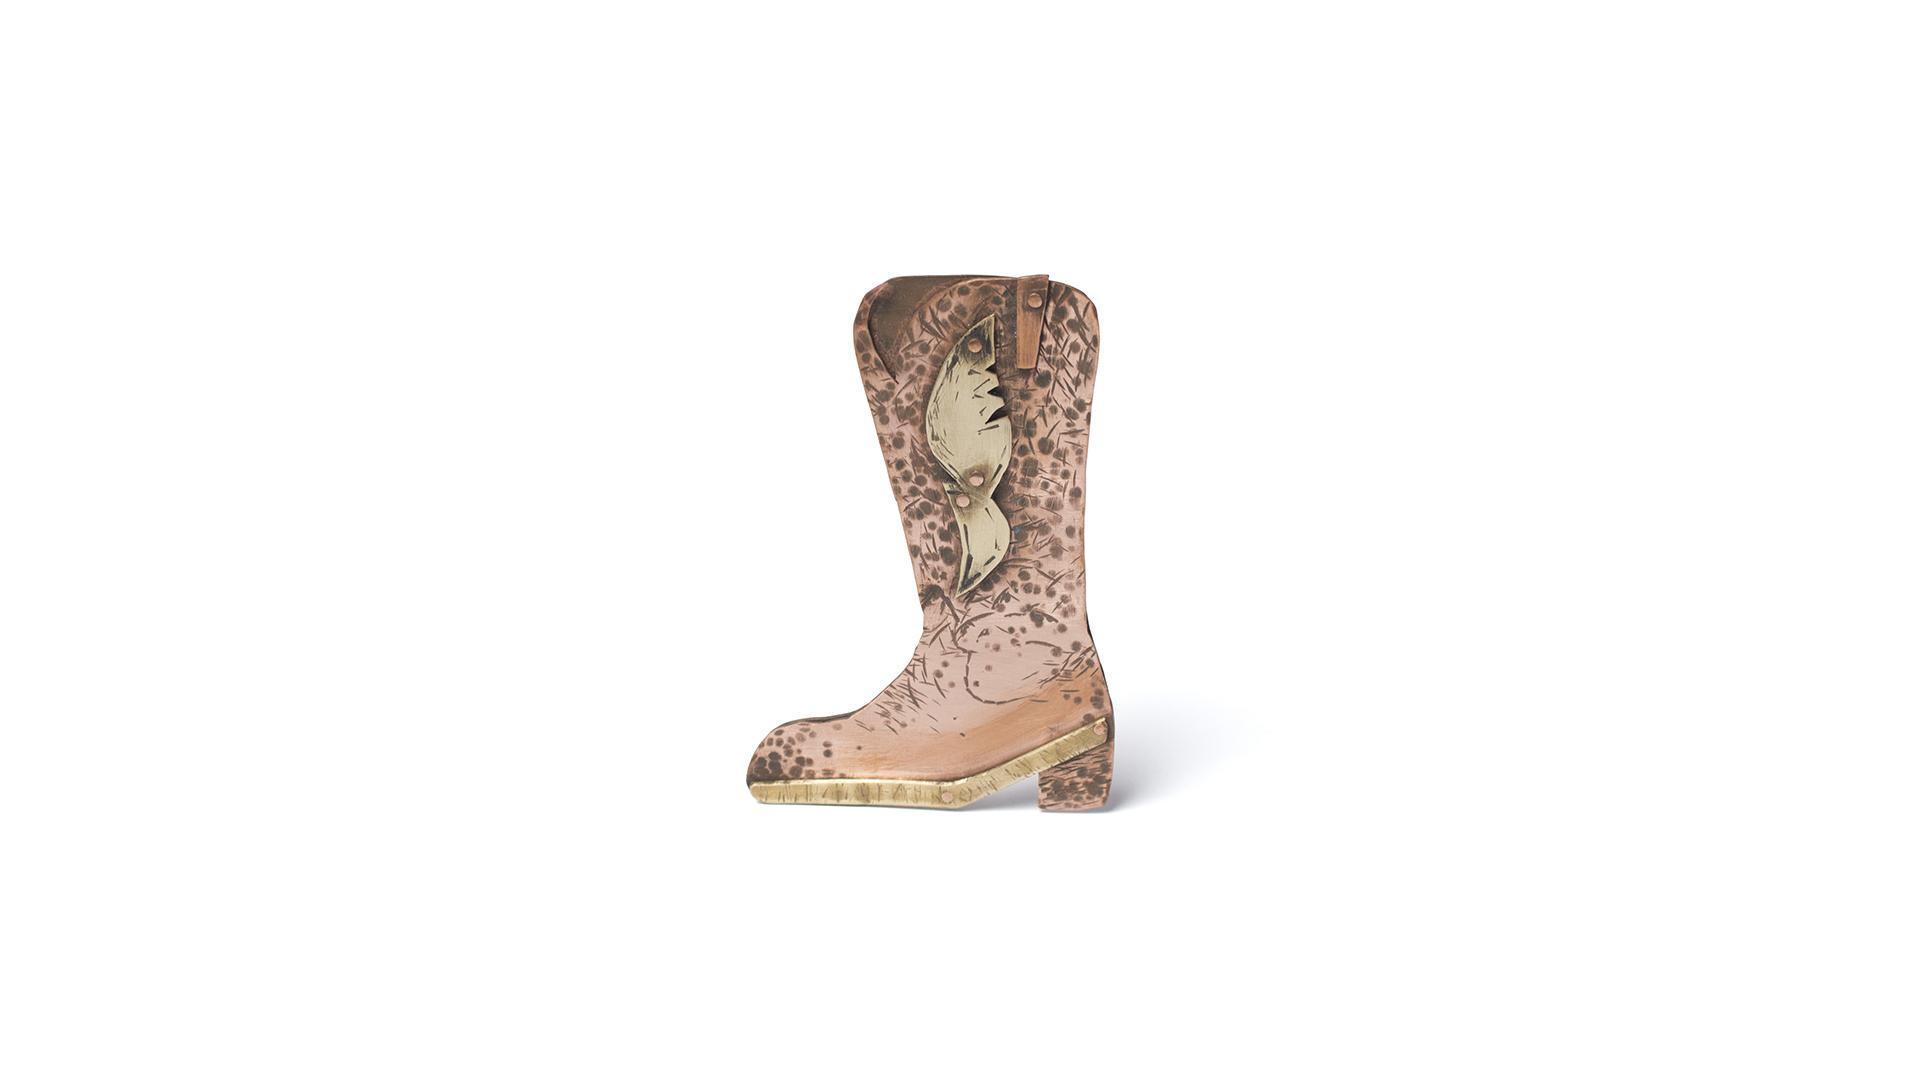 Camden Courtney, Grandpa's Boot